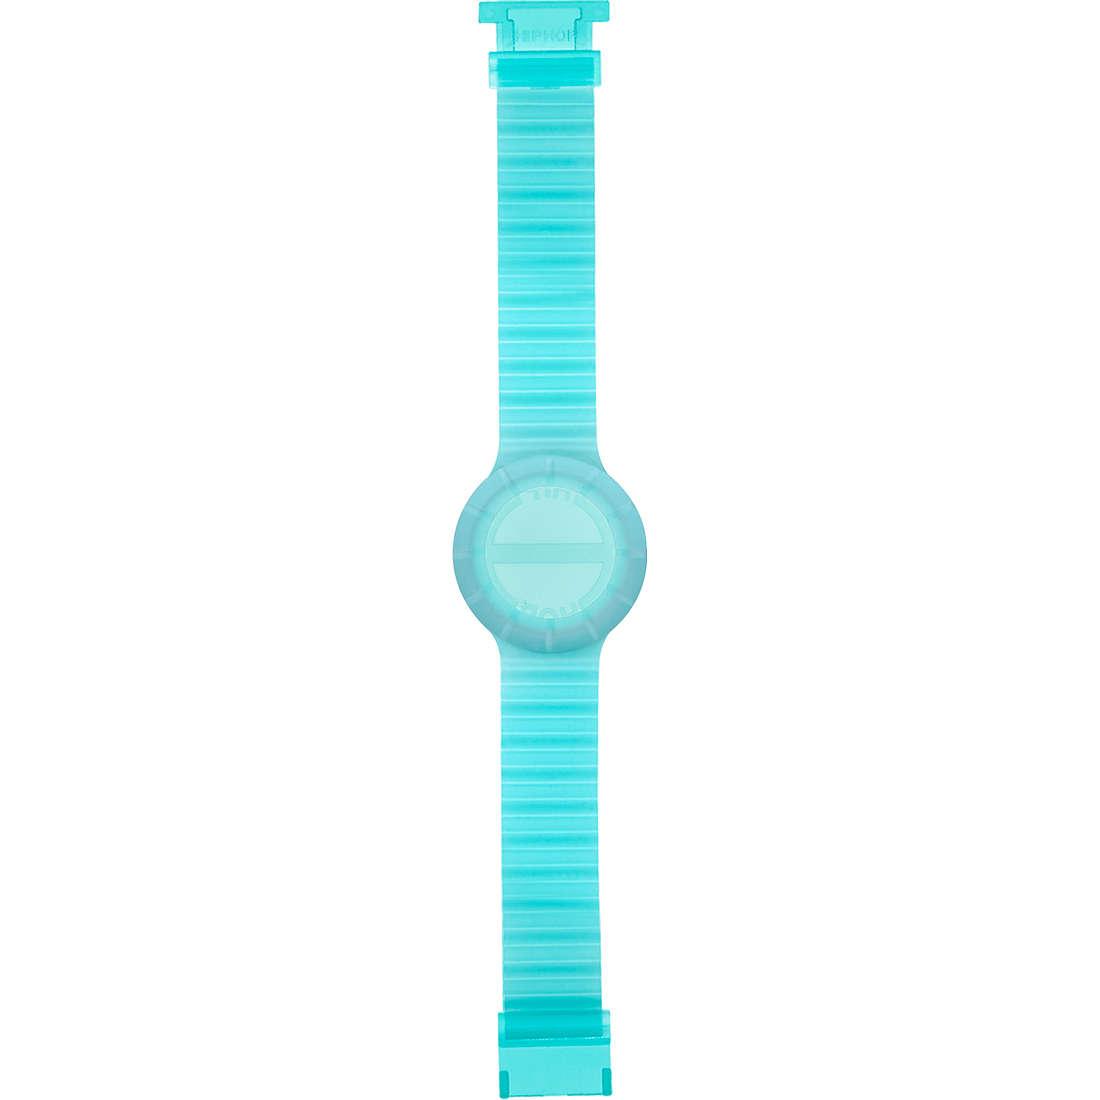 orologio accessorio unisex Hip Hop HBU0101